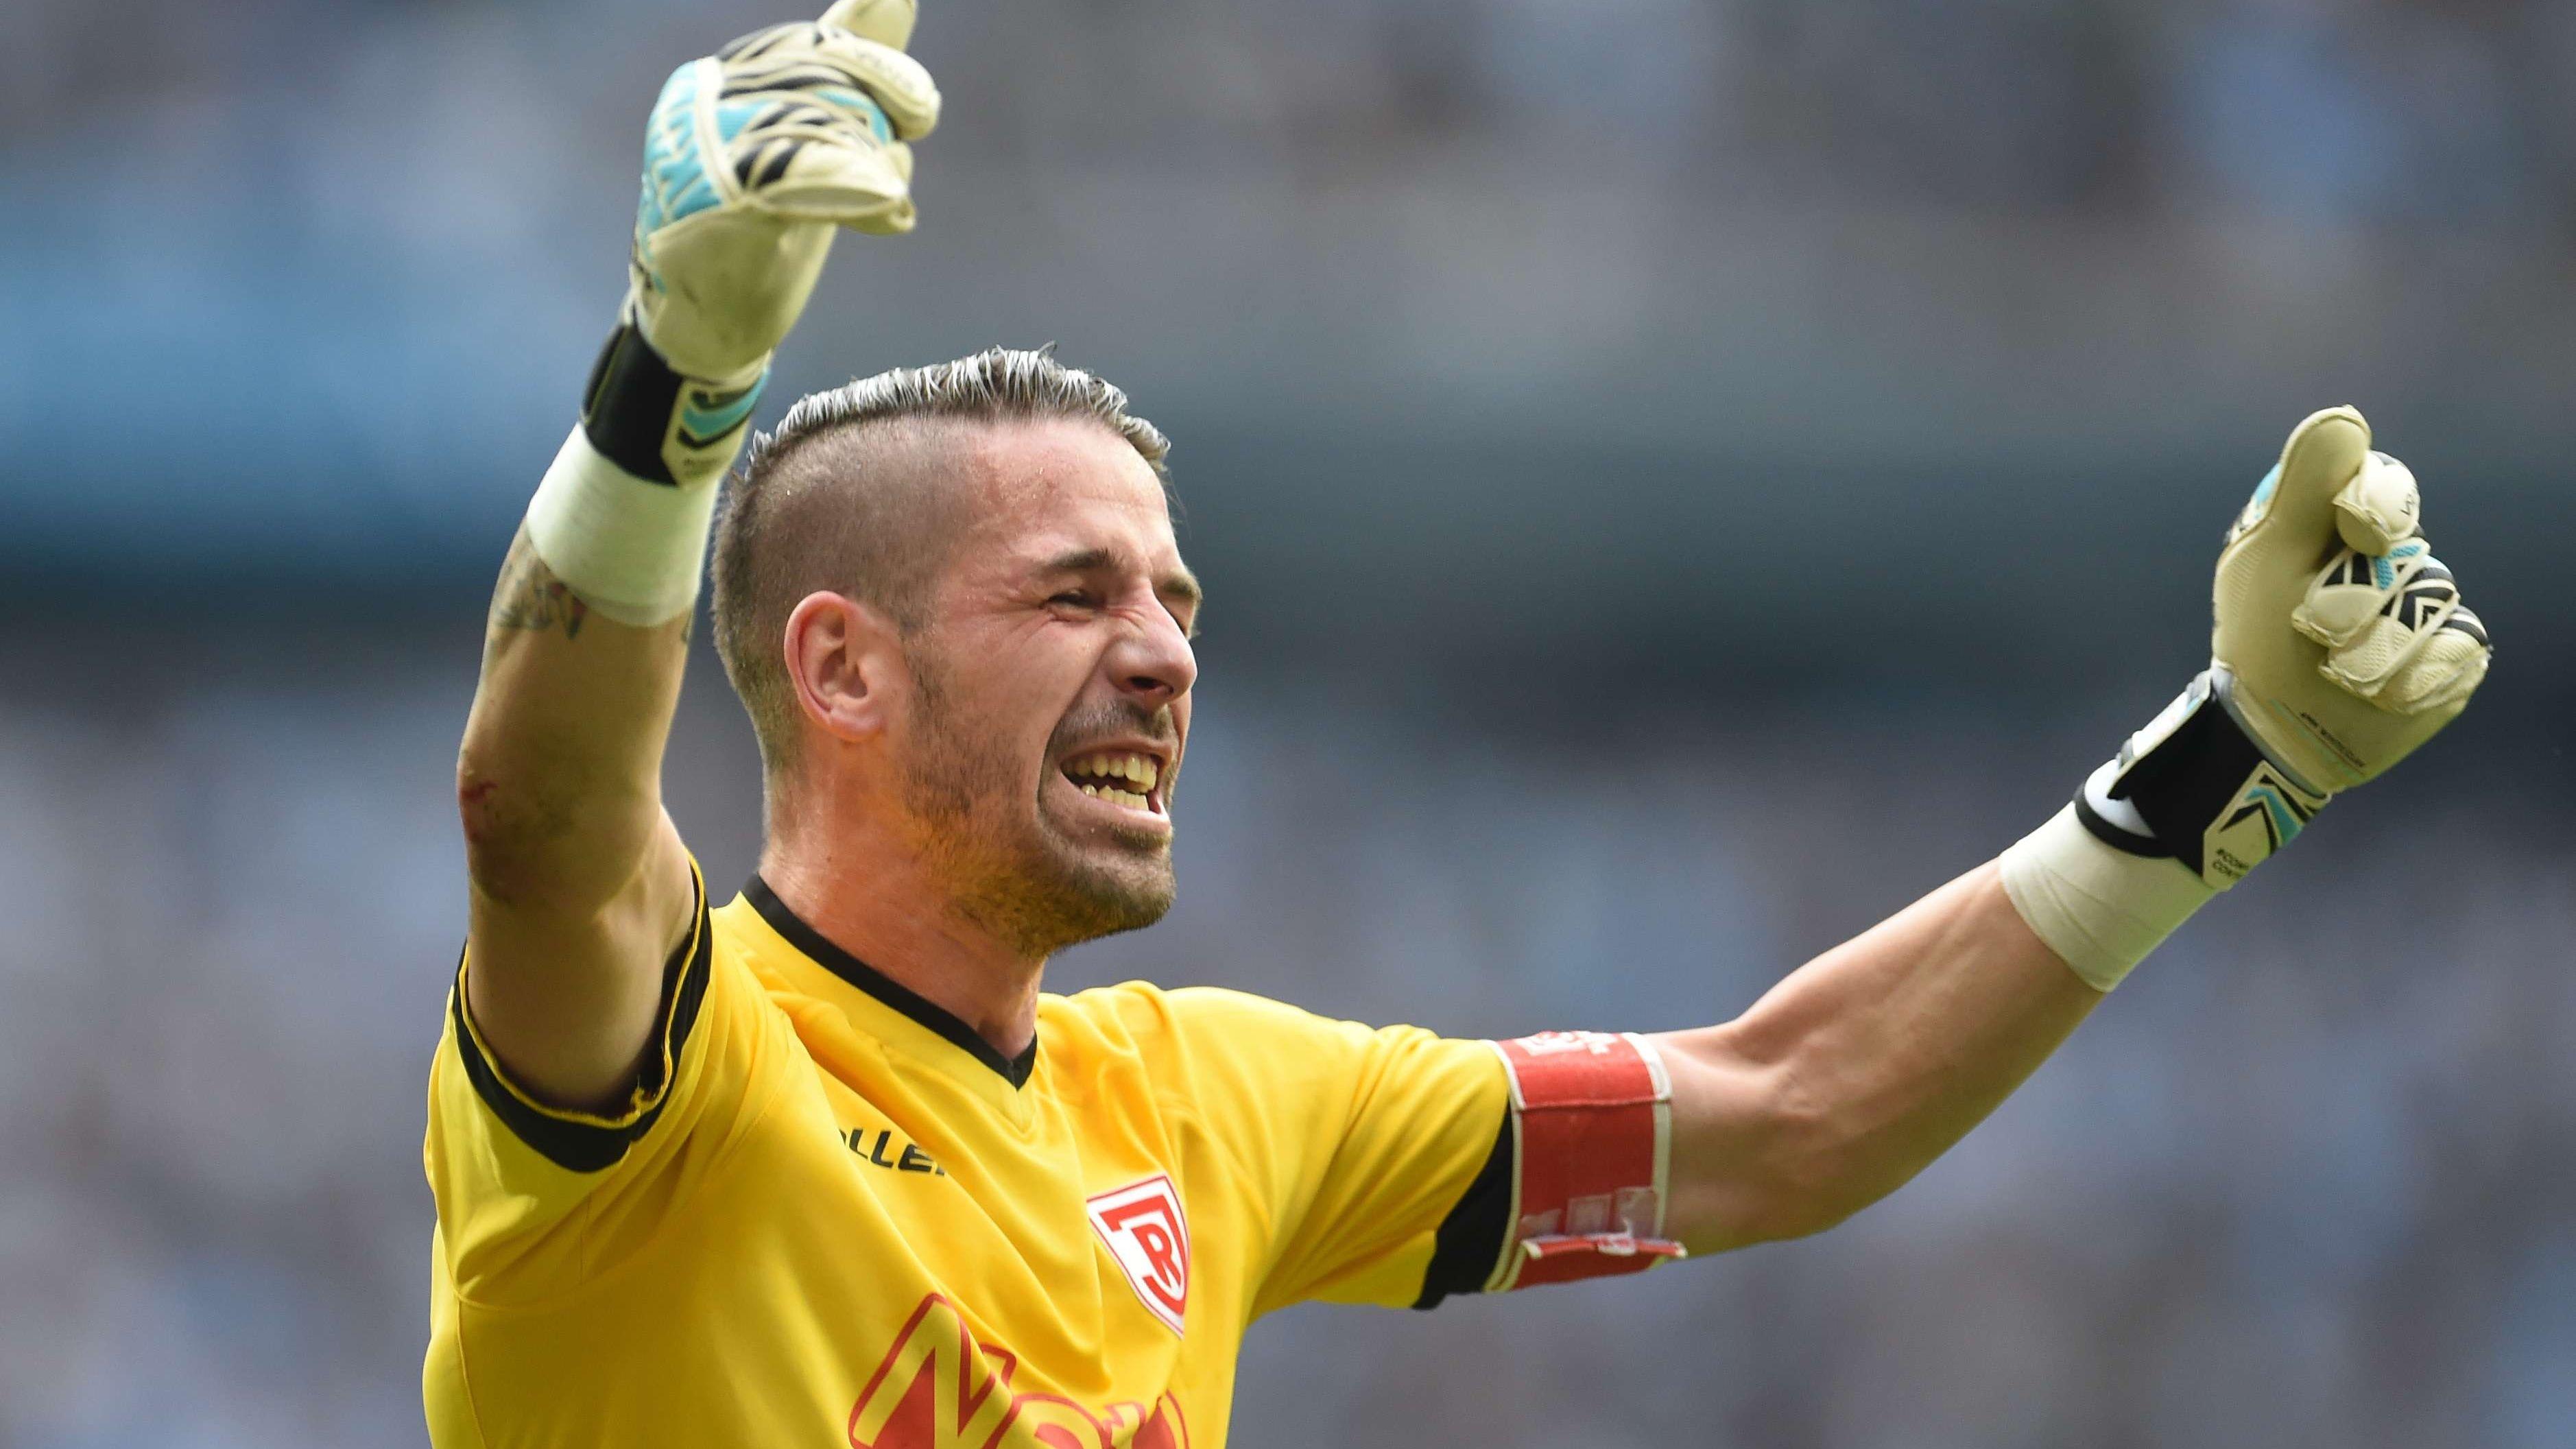 Torwart Phillip Pentke wechselt in die 1. Bundesliga.